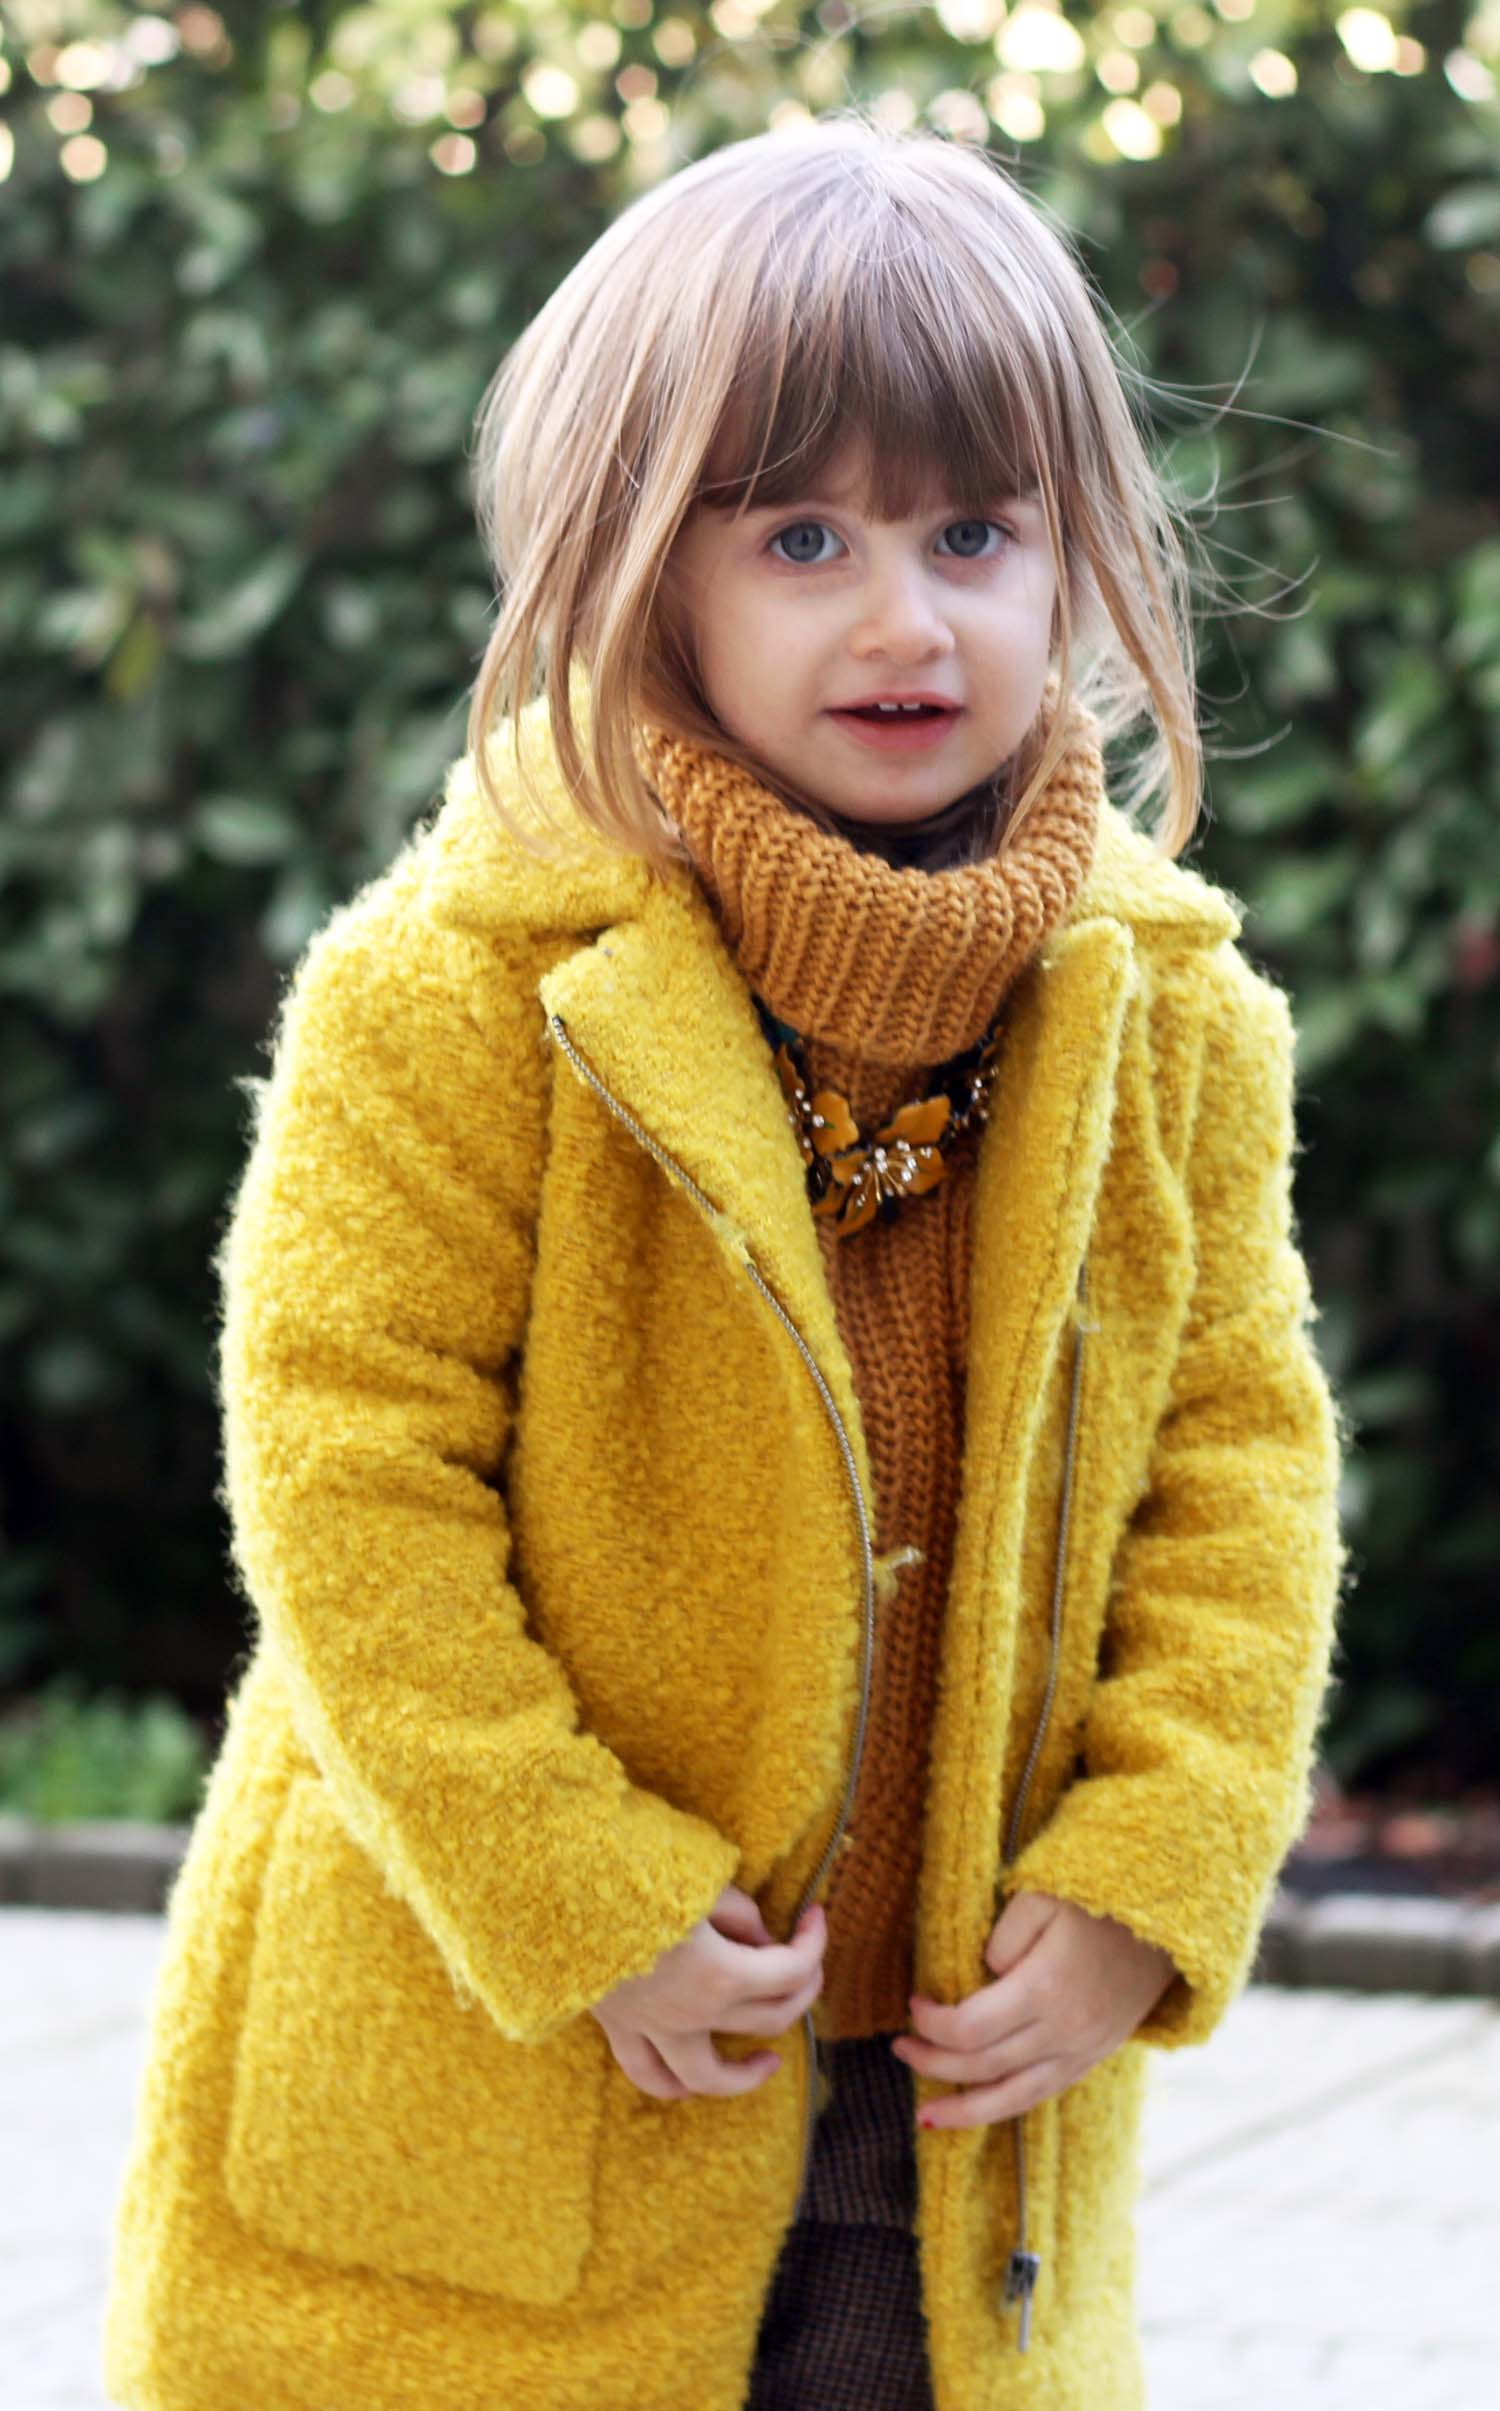 GAIA MASSERONI - COZY STYLE MODA BIMBA OUTFIT INVERNALE FASHION KIDS ITALIA